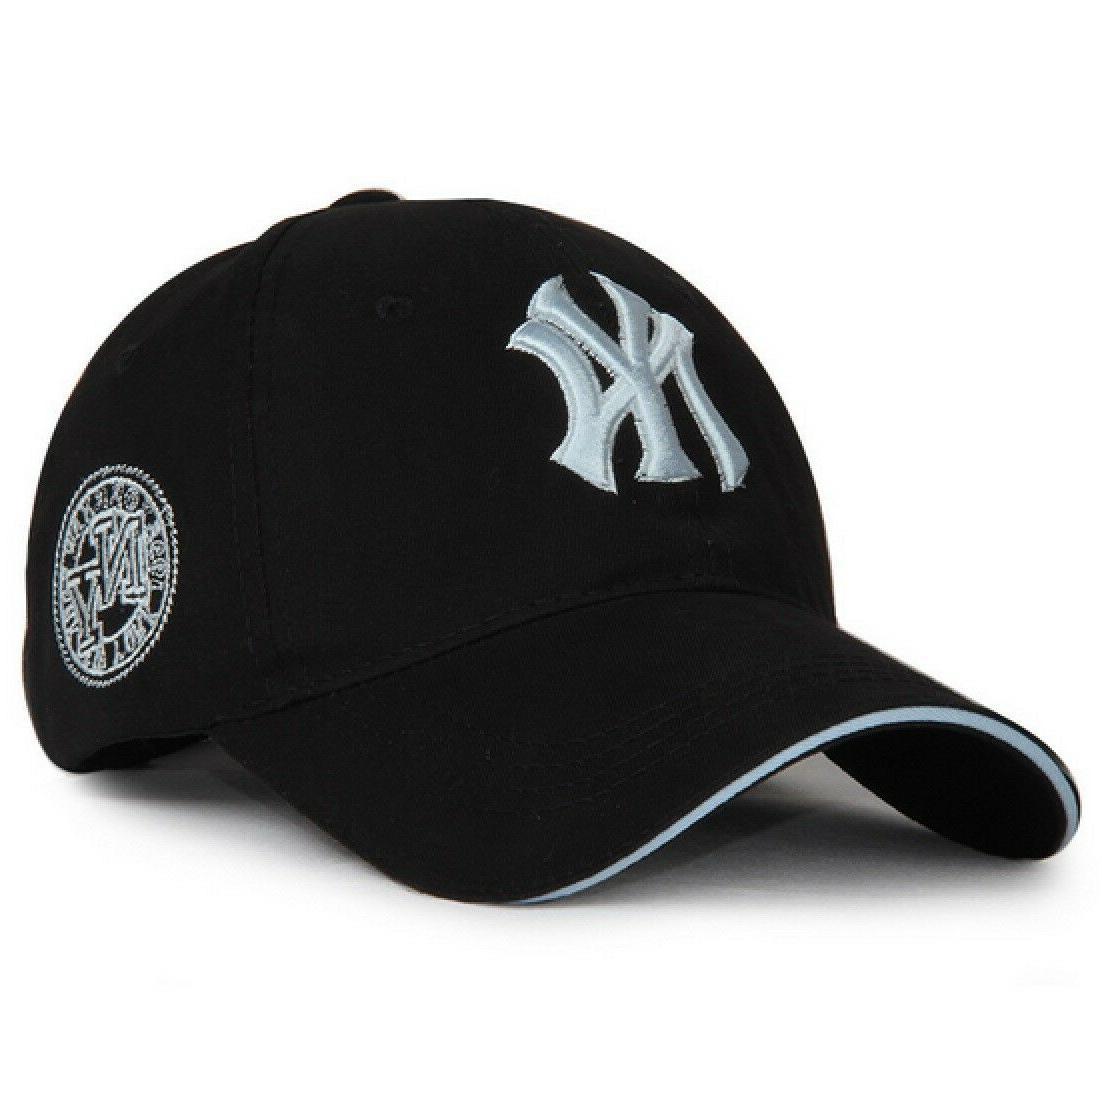 New Yankees Caps Adjustable NY Hat Men